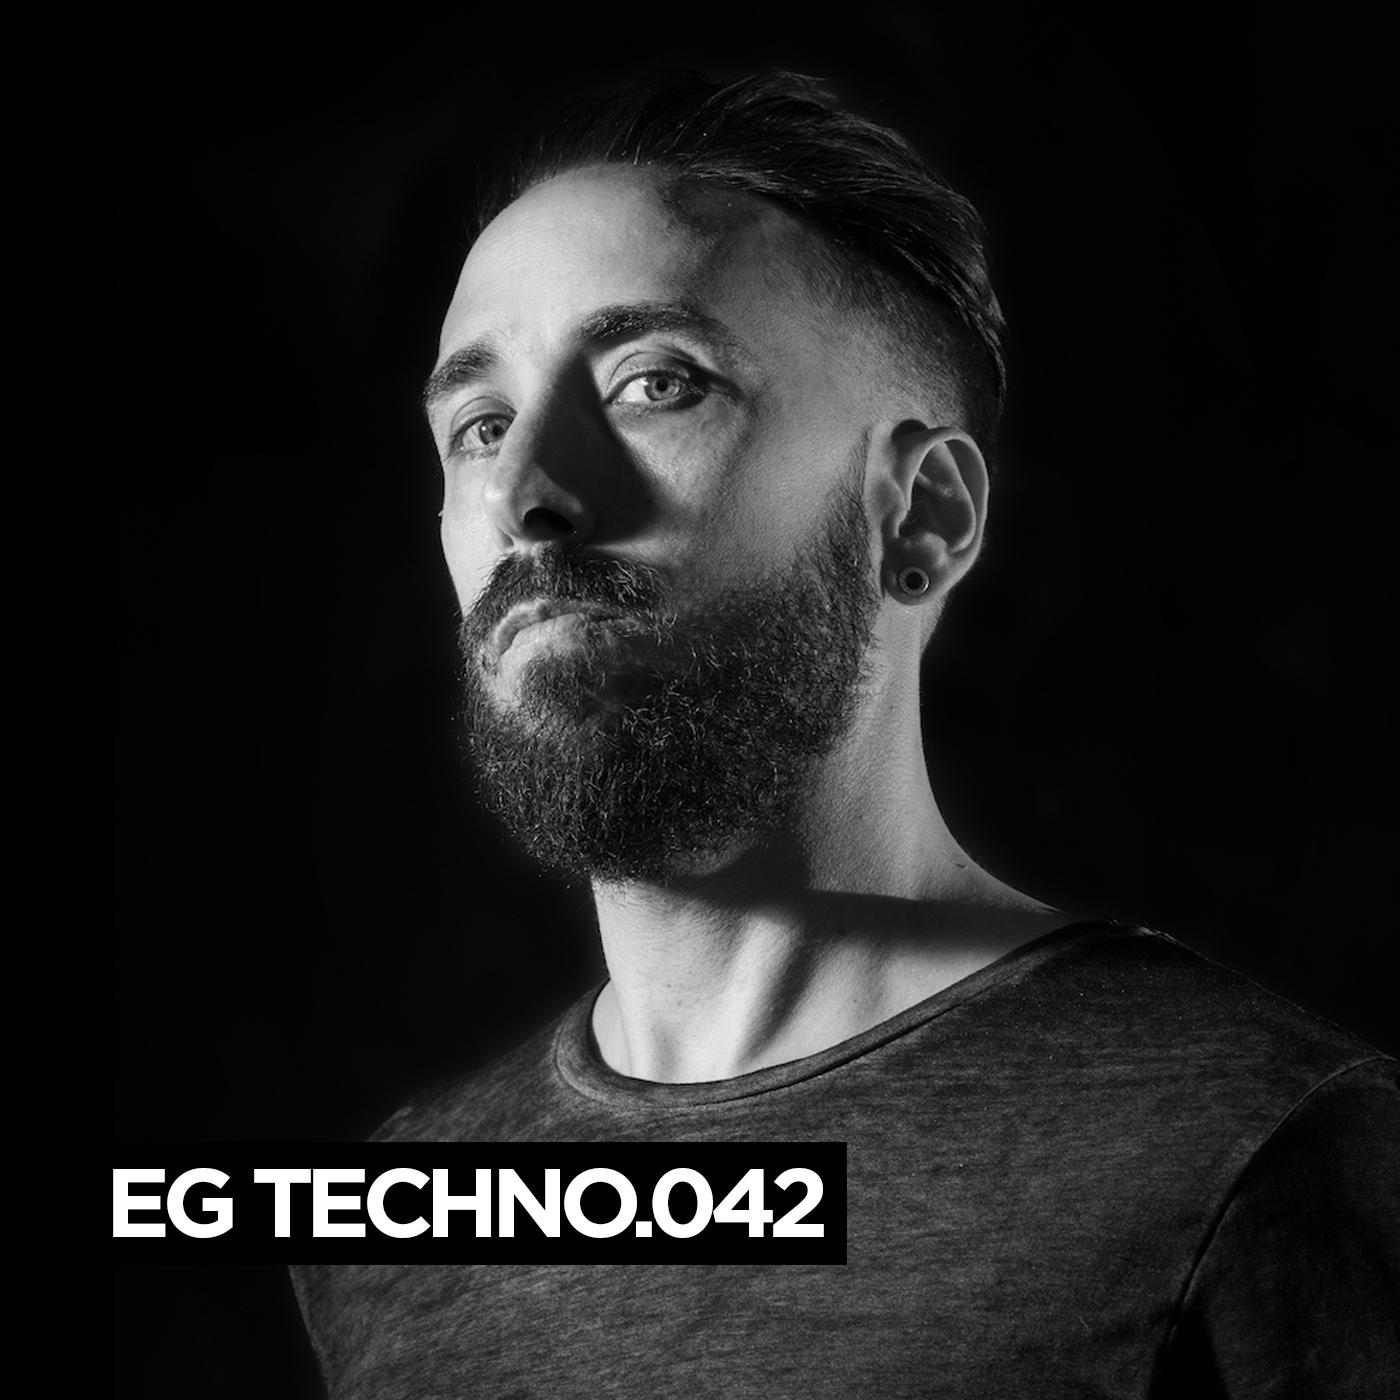 EG-TECHNO-042-Cristian-Varela